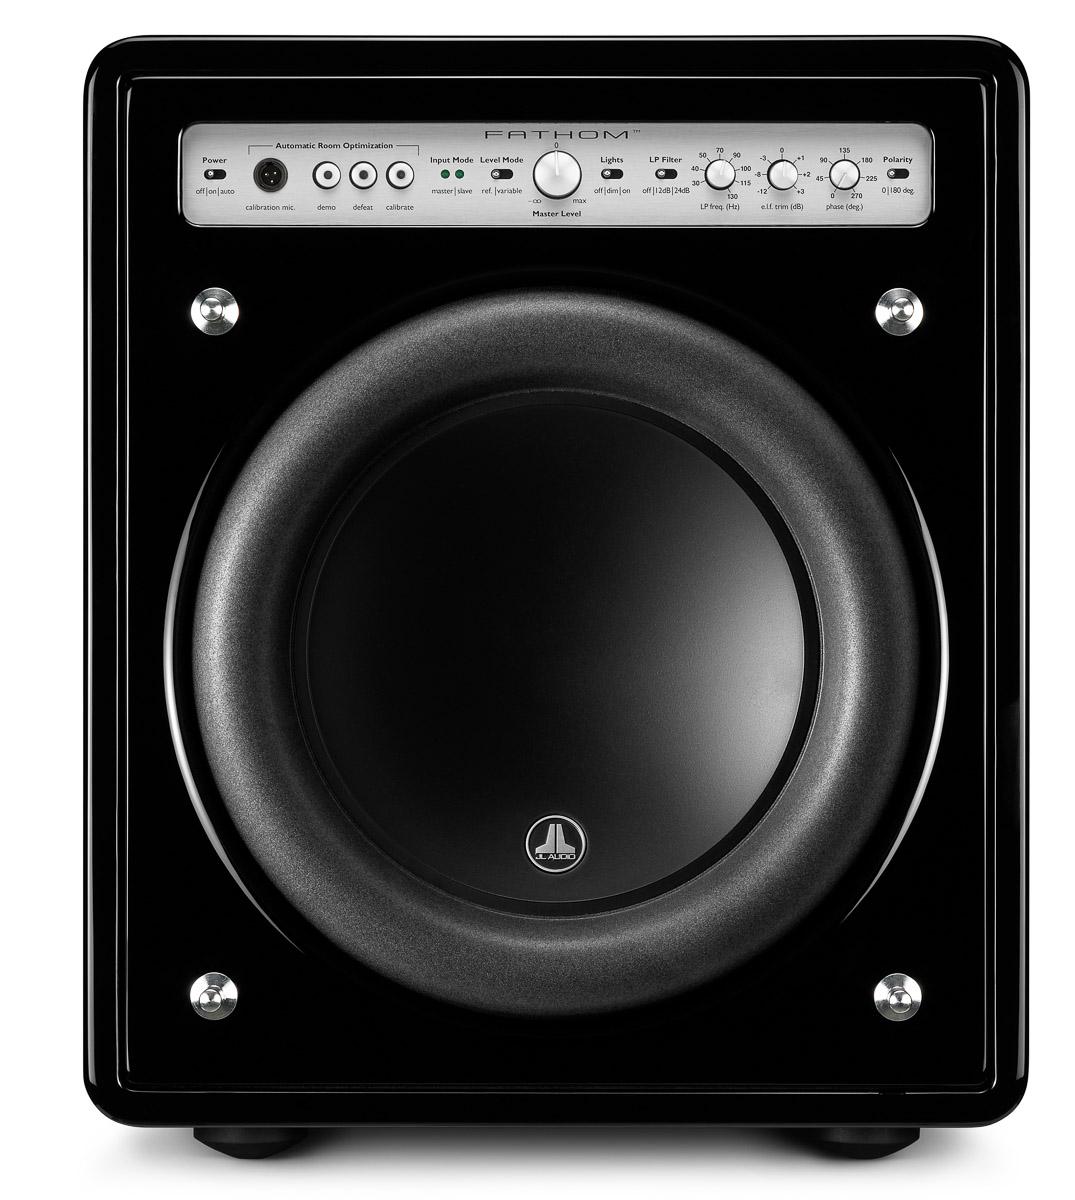 jl audio fathom f110v2 gloss fathom v2 wiring diagram furthermore jl audio w7 ho box likewise jl audio w7 [ 1075 x 1200 Pixel ]